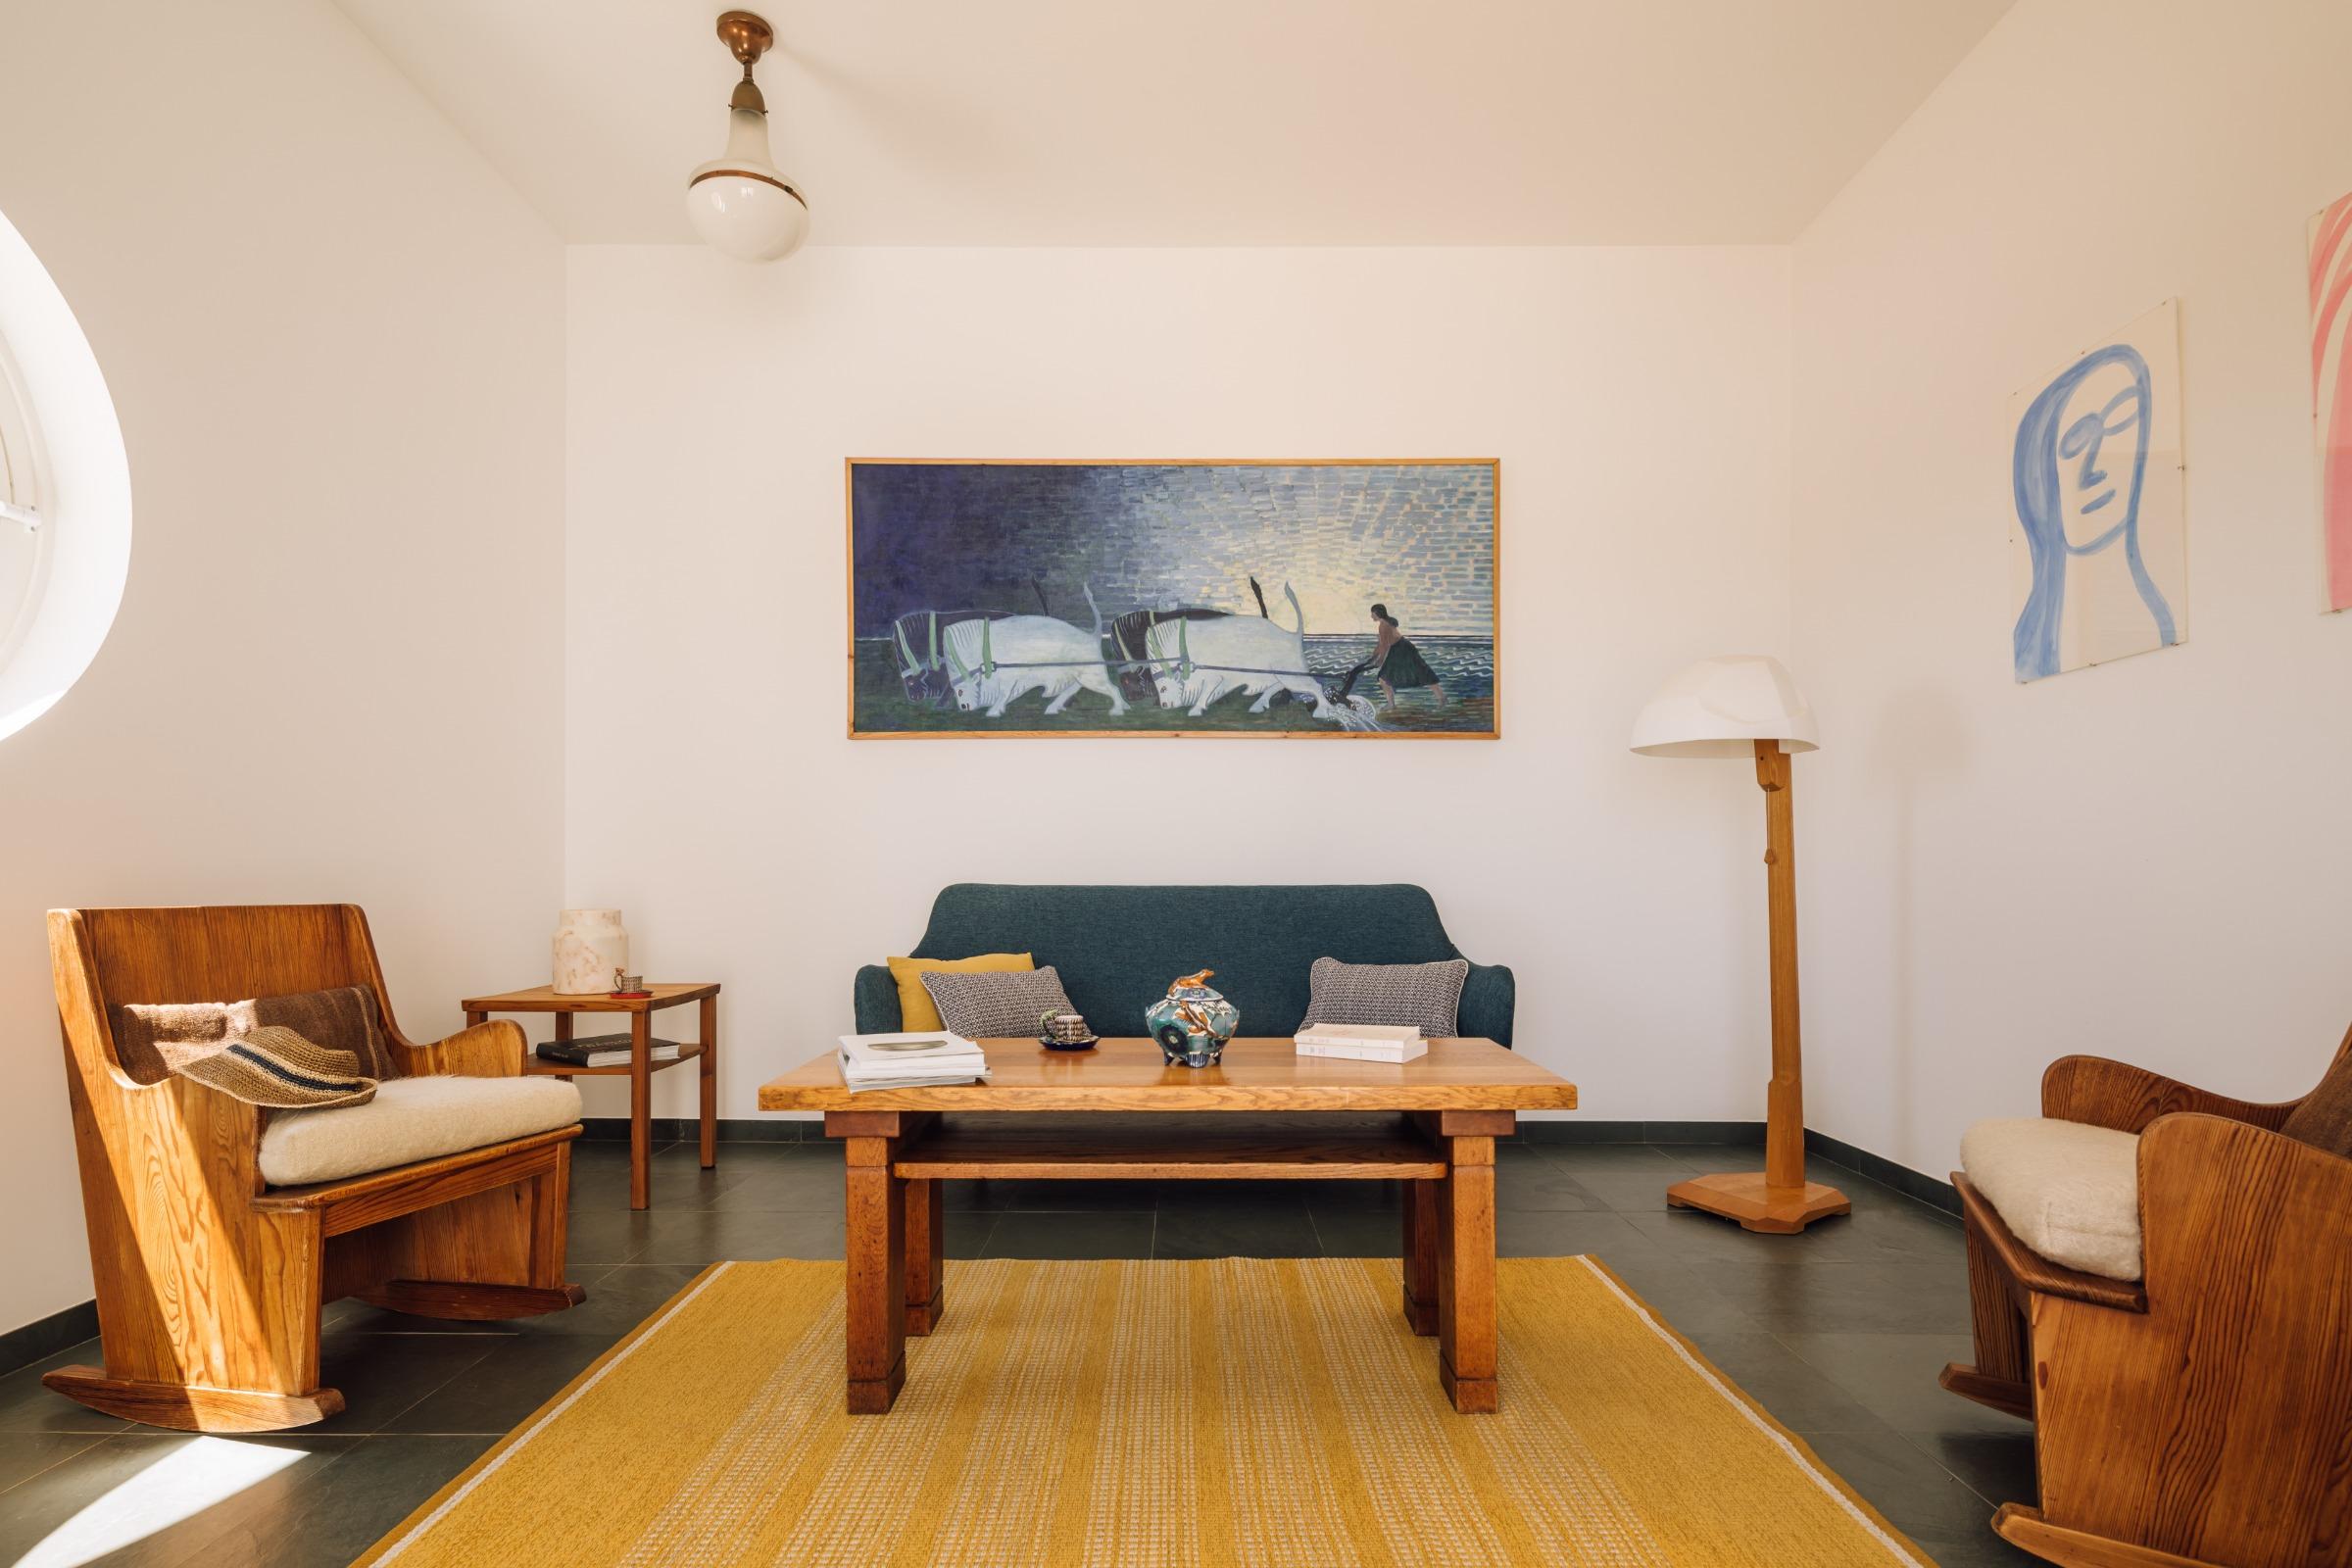 Dalicenca pt stay suite mypool 5